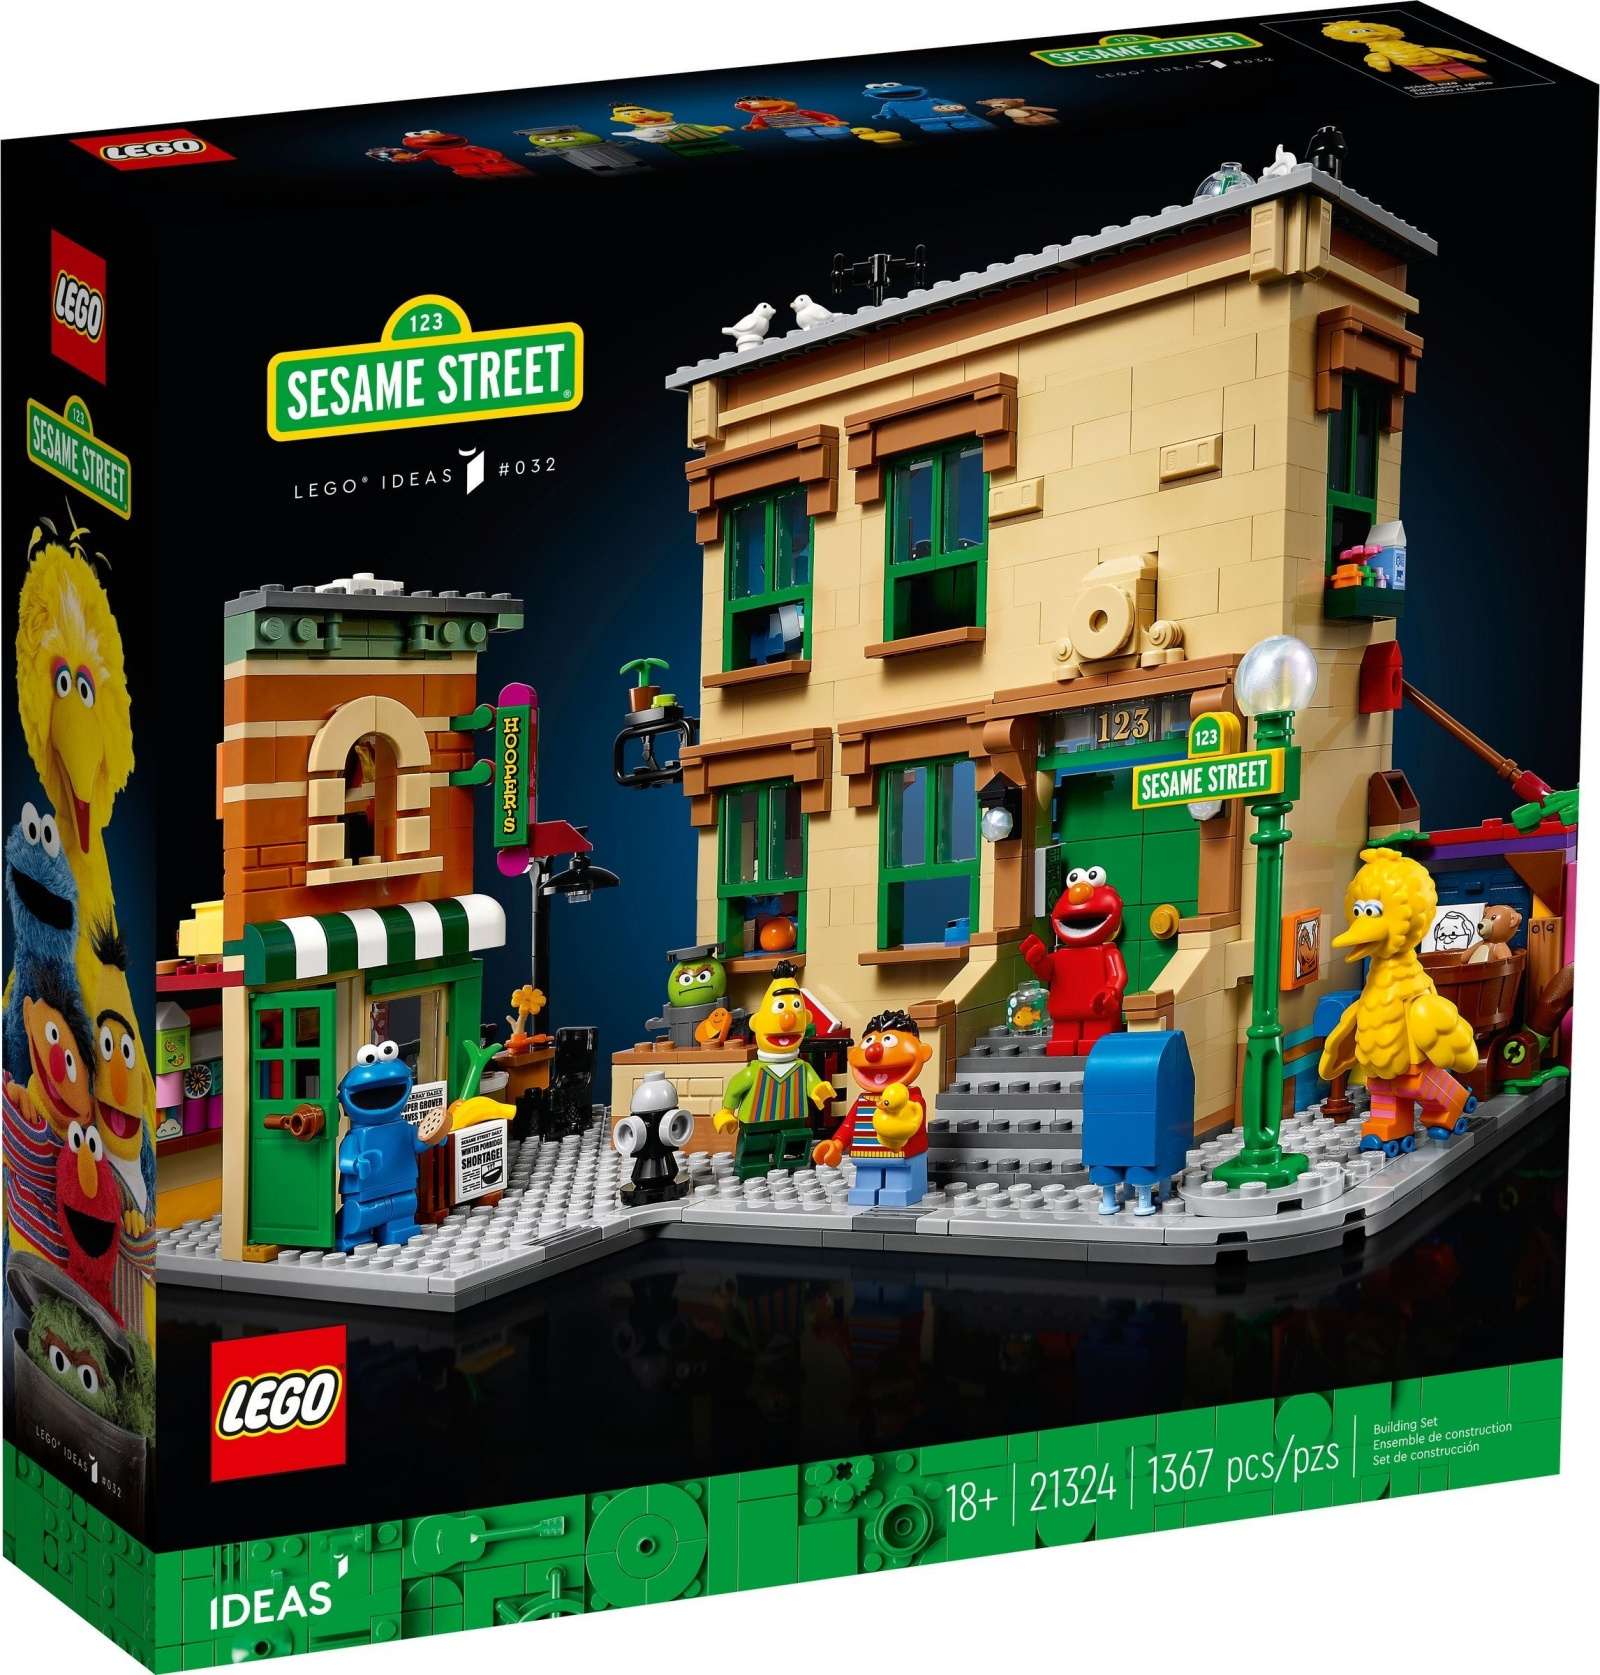 21324 LEGO Ideas 123 Sesame Street